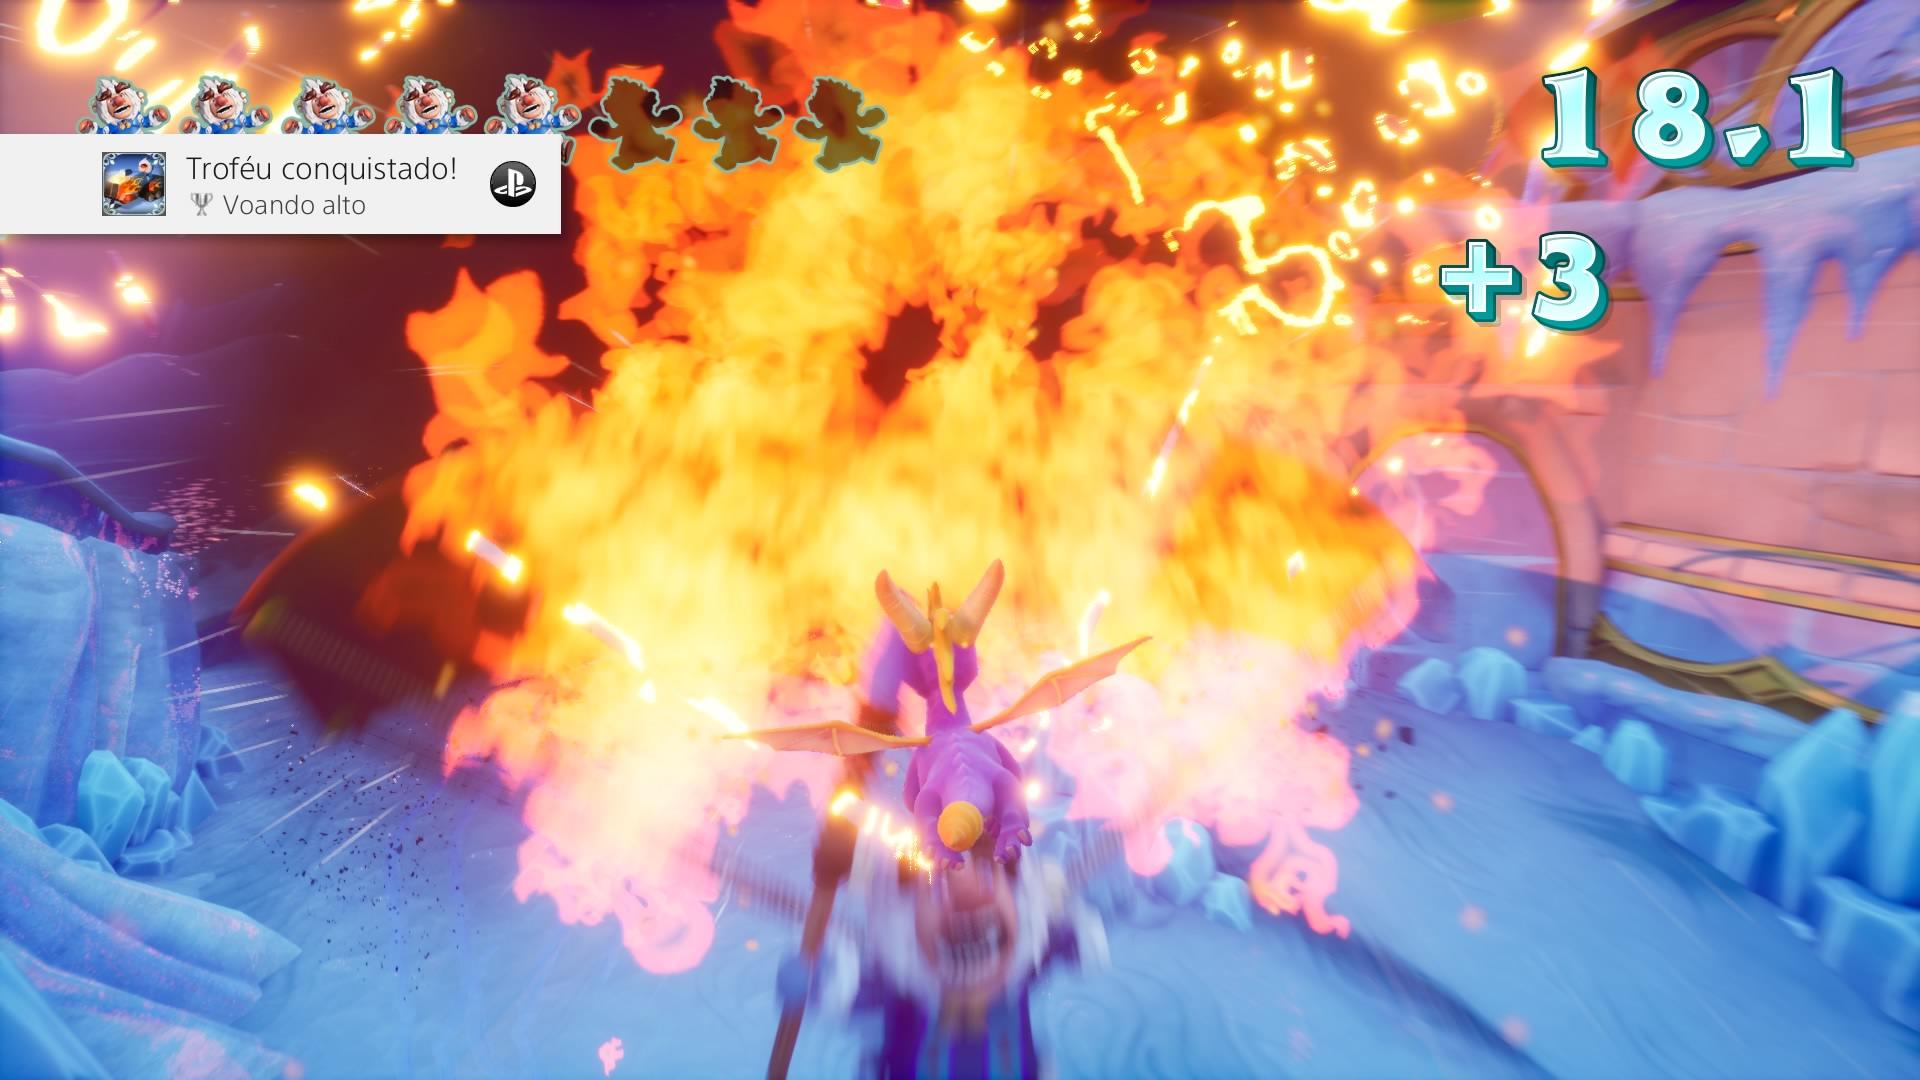 Análise] Spyro Reignited Trilogy: Vale a pena?